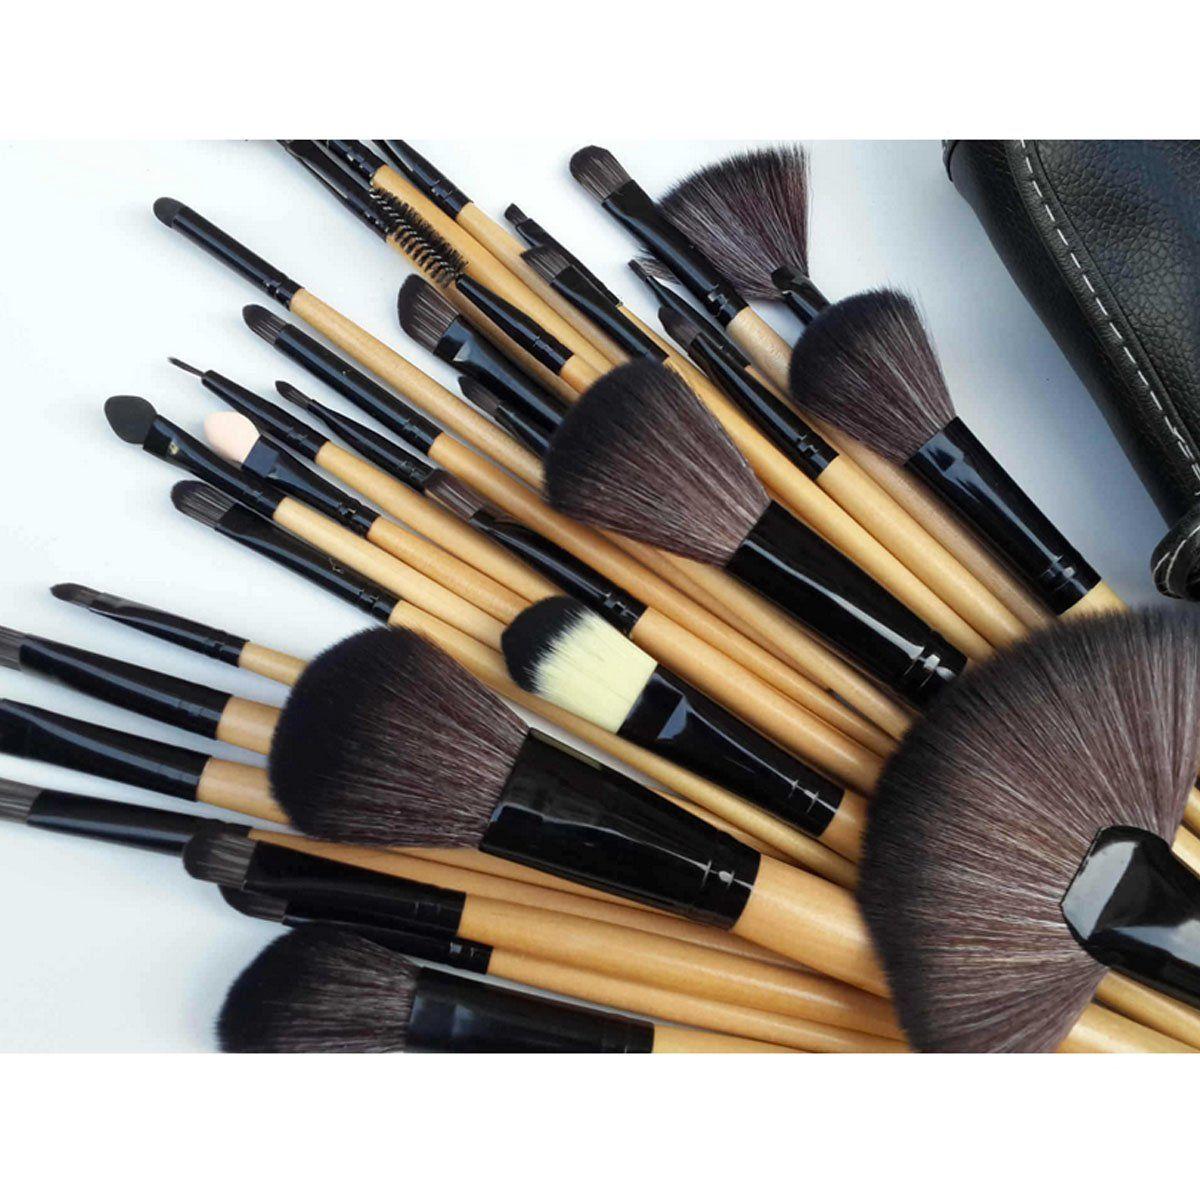 15 pcs Foundation Cream Blush Eyeshadow Eyeliner Eyebrow